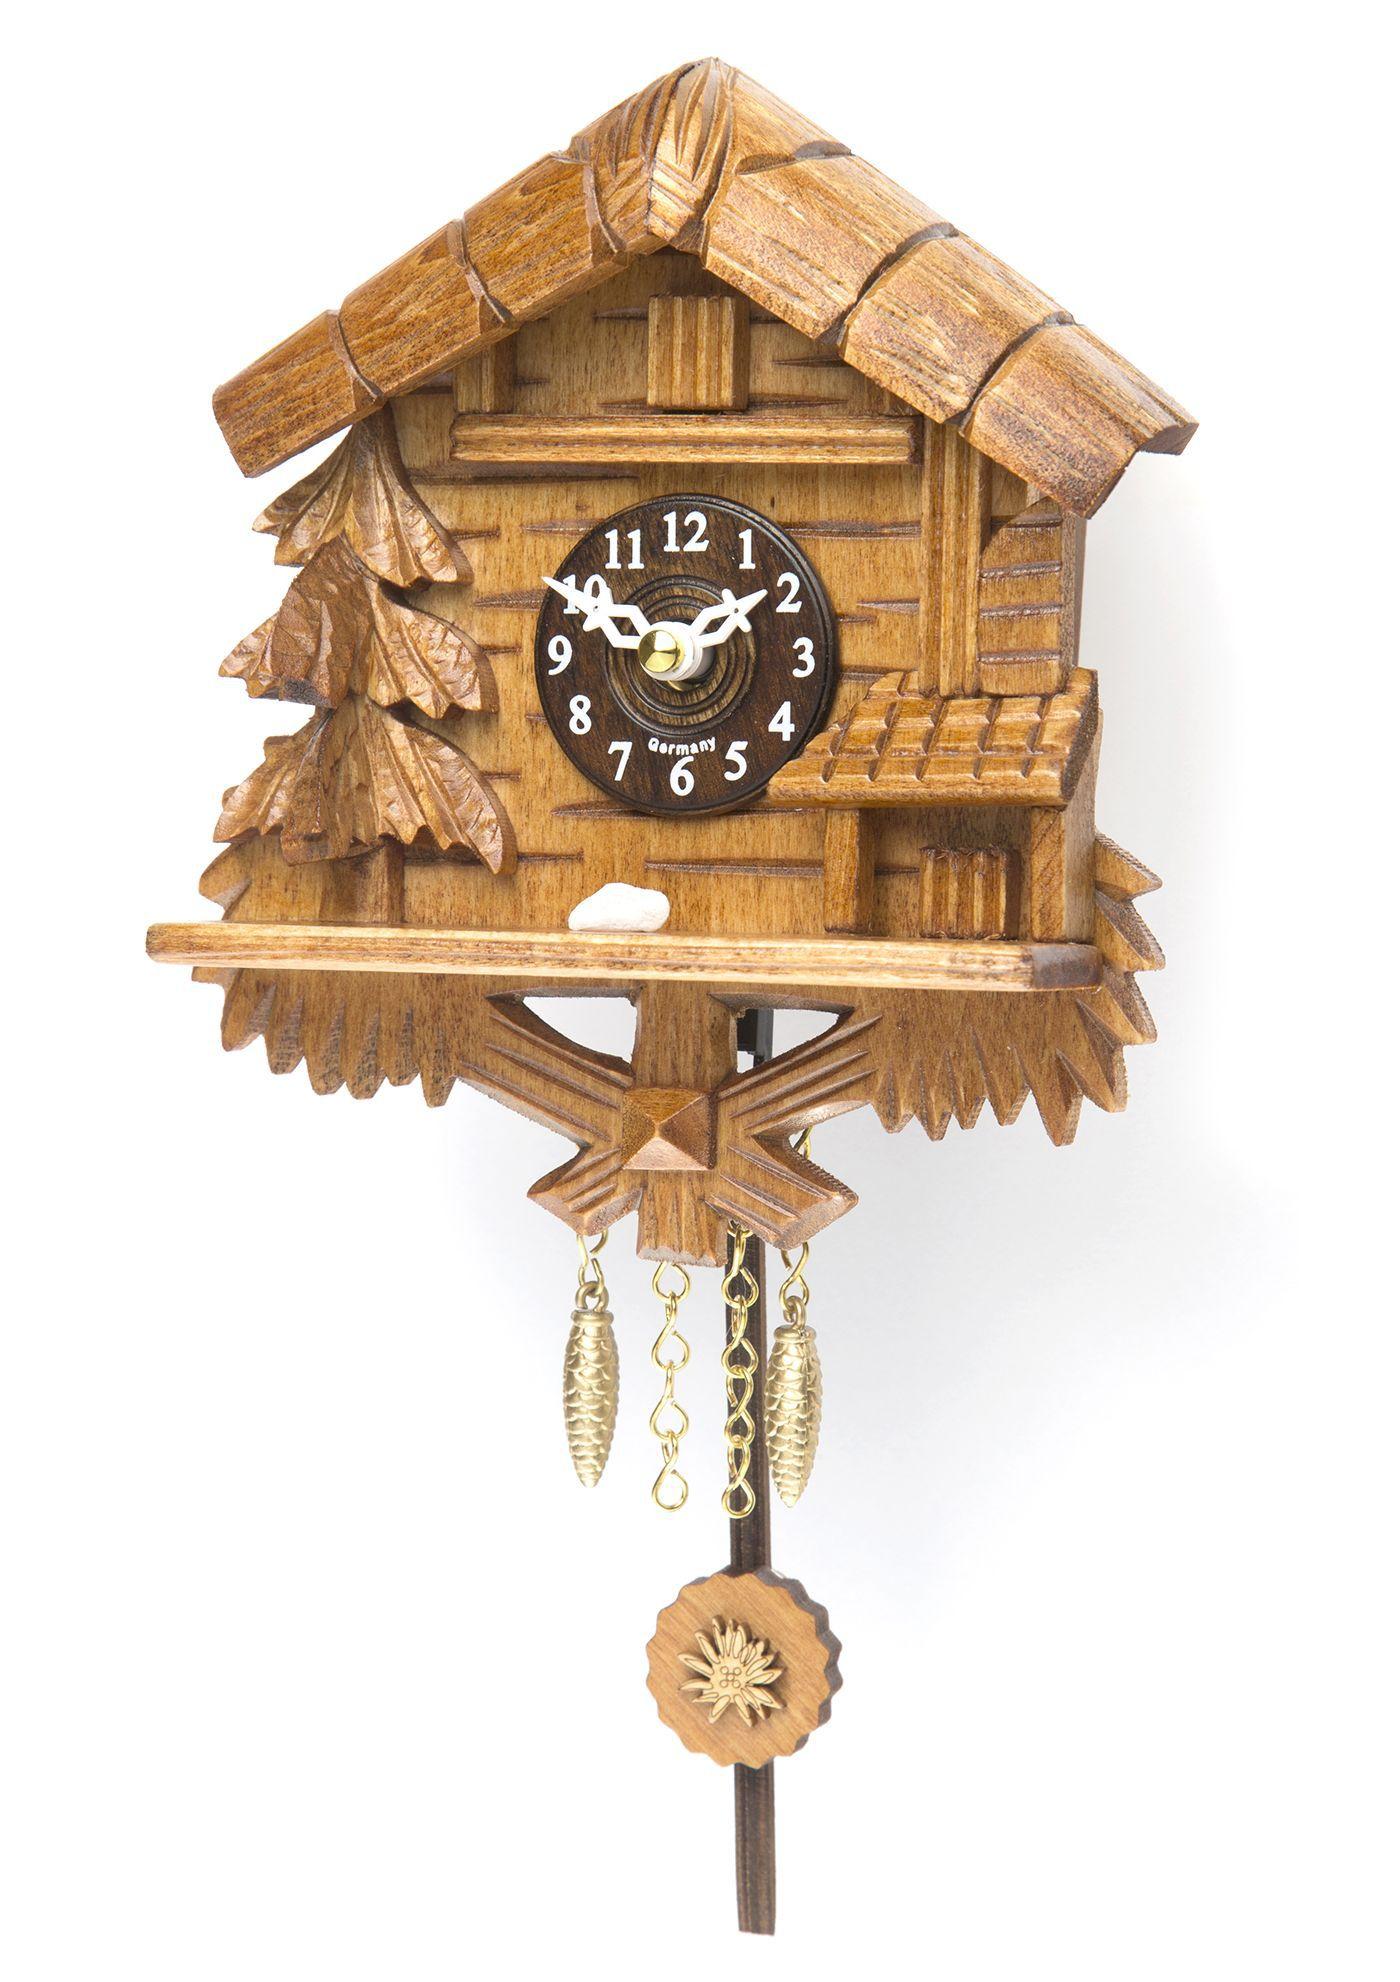 Часы настенные Часы настенные с кукушкой Tomas Stern 5020 chasy-nastennye-s-kukushkoy-tomas-stern-5020-germaniya.jpg